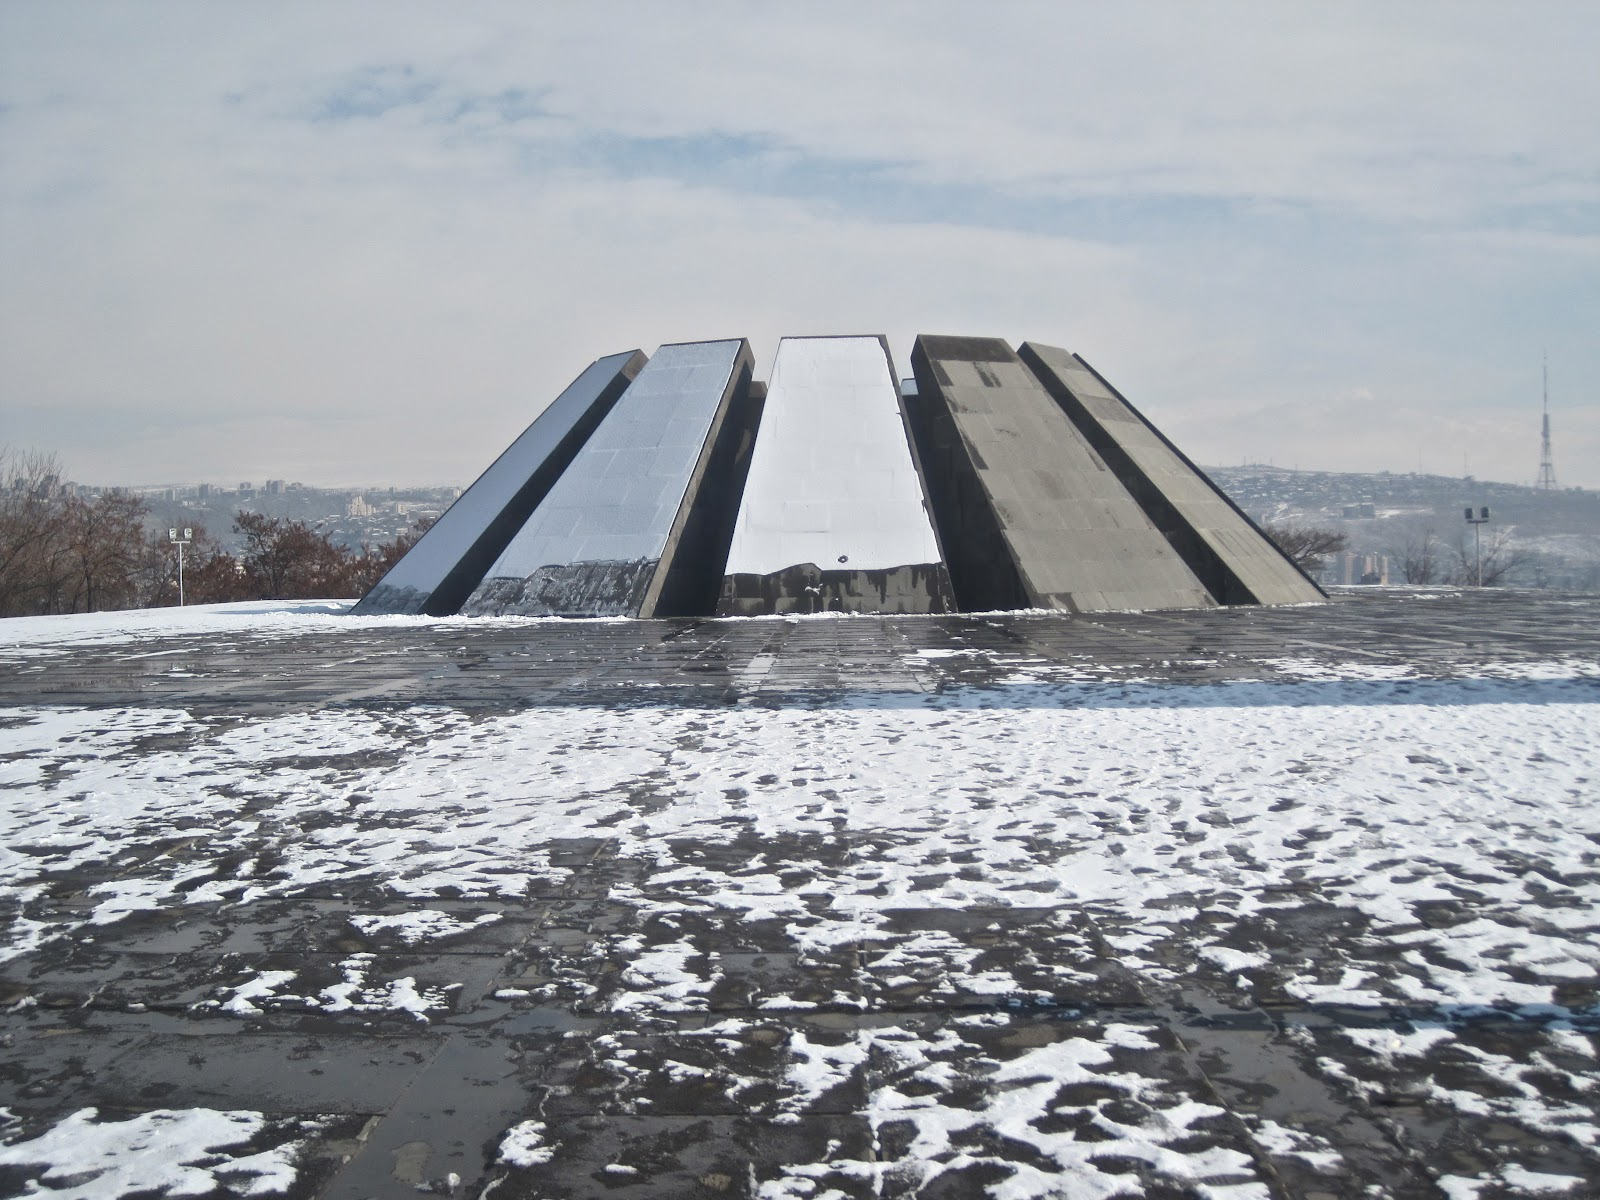 Day 2 in Armenia began...